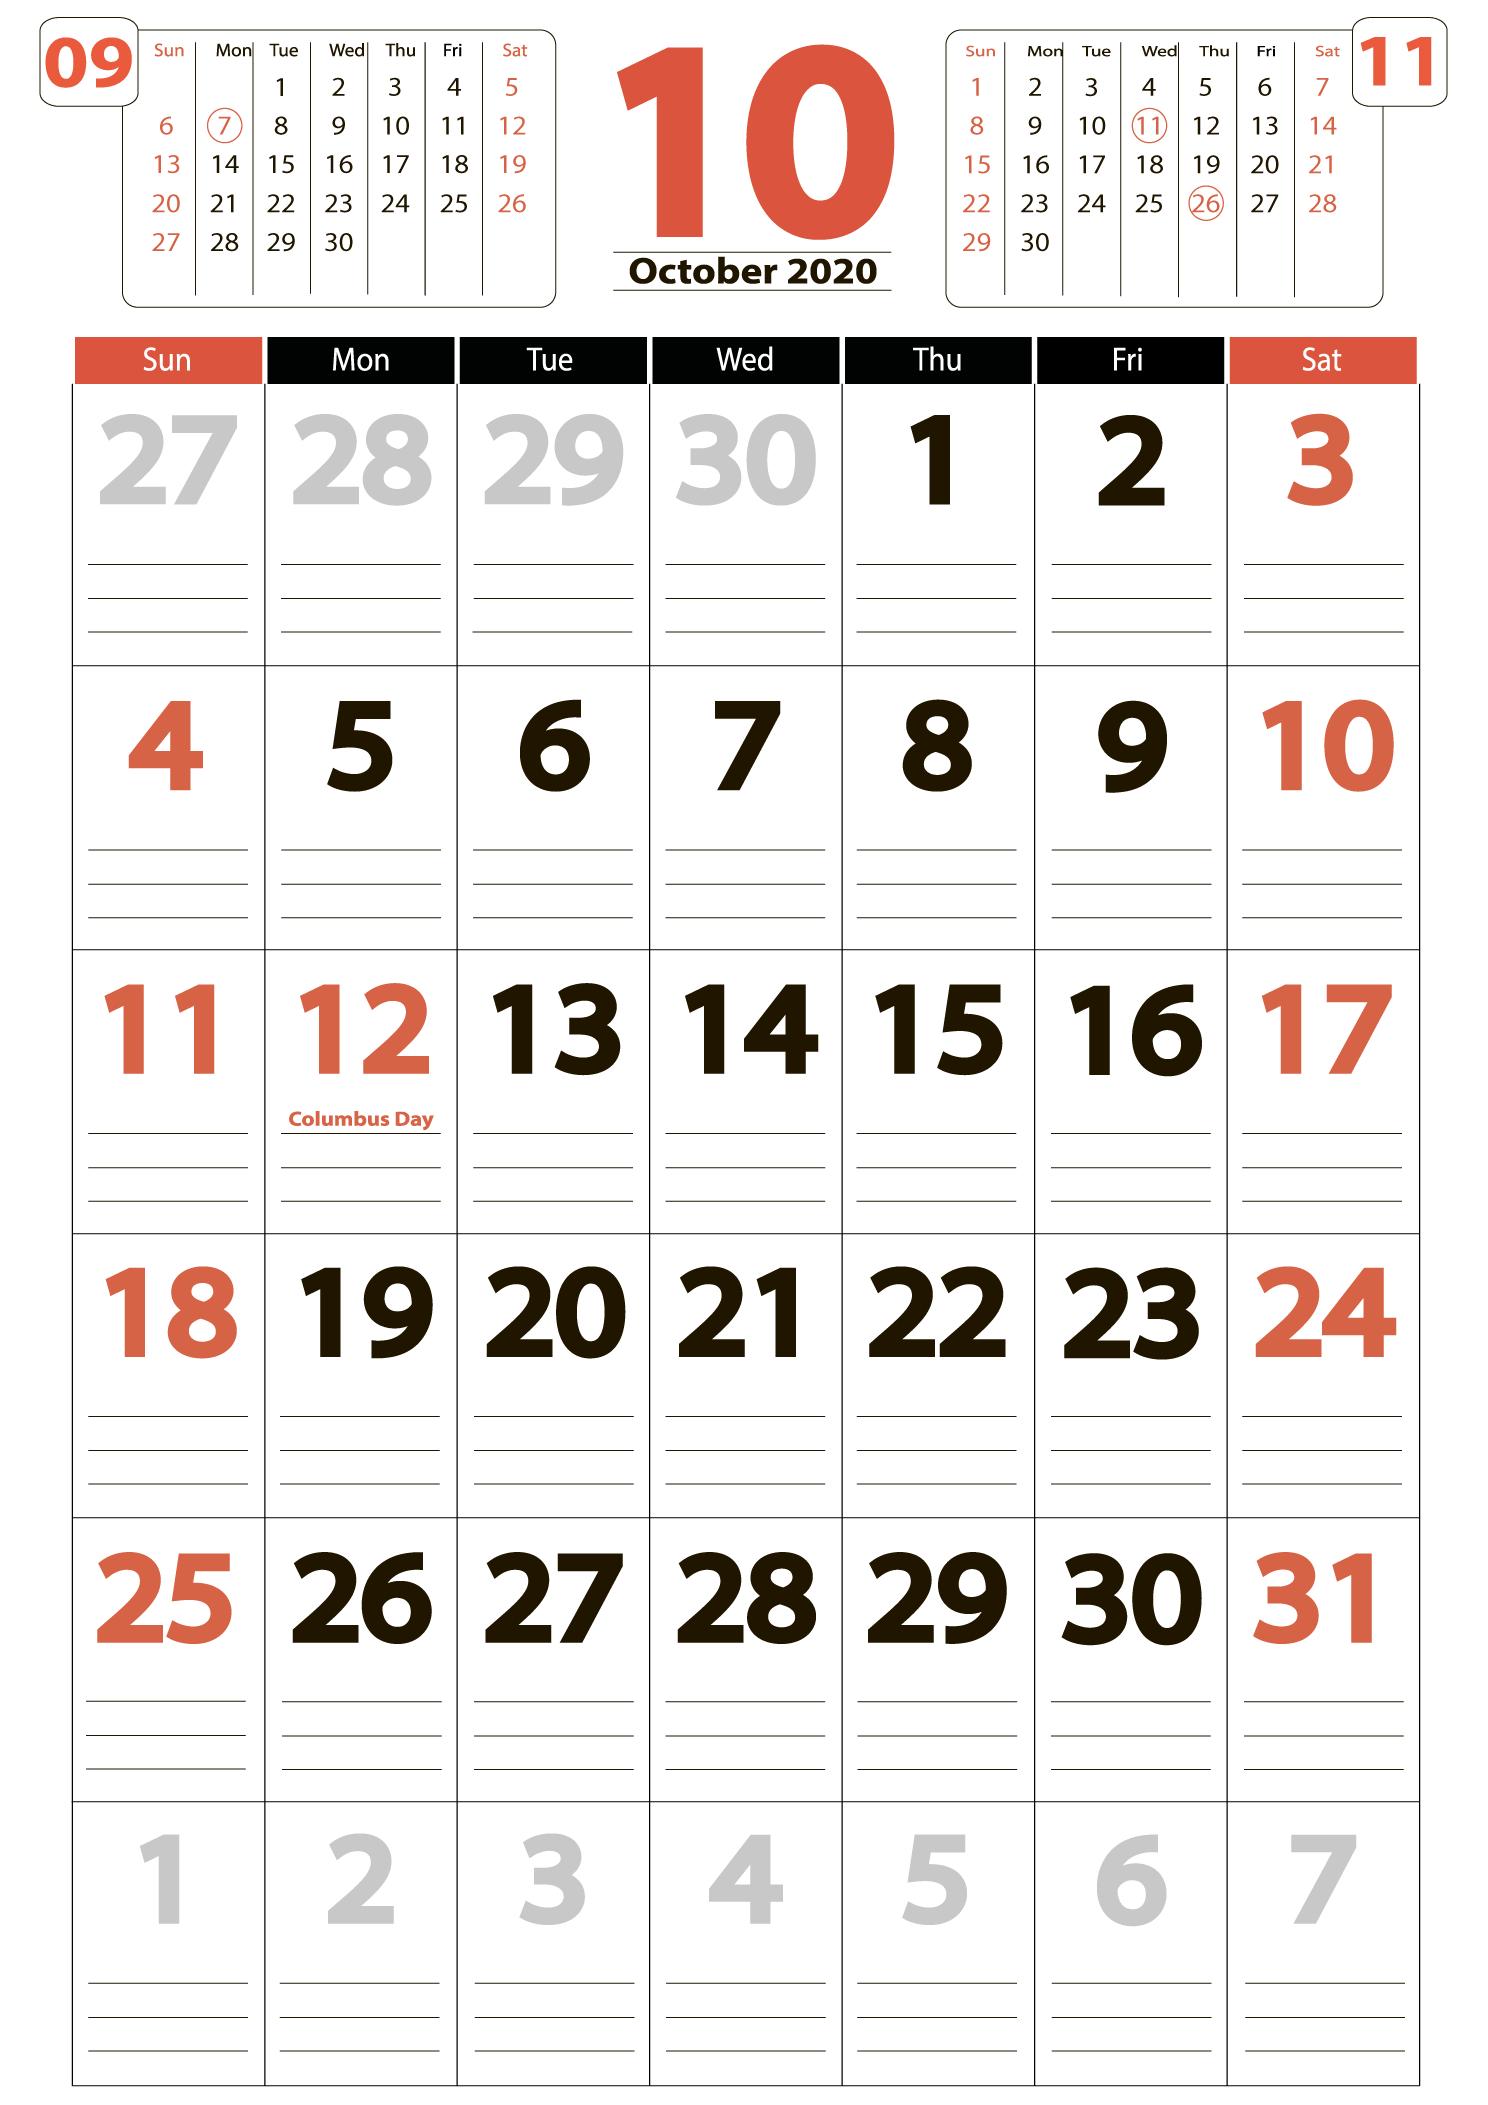 Download calendar october 2020